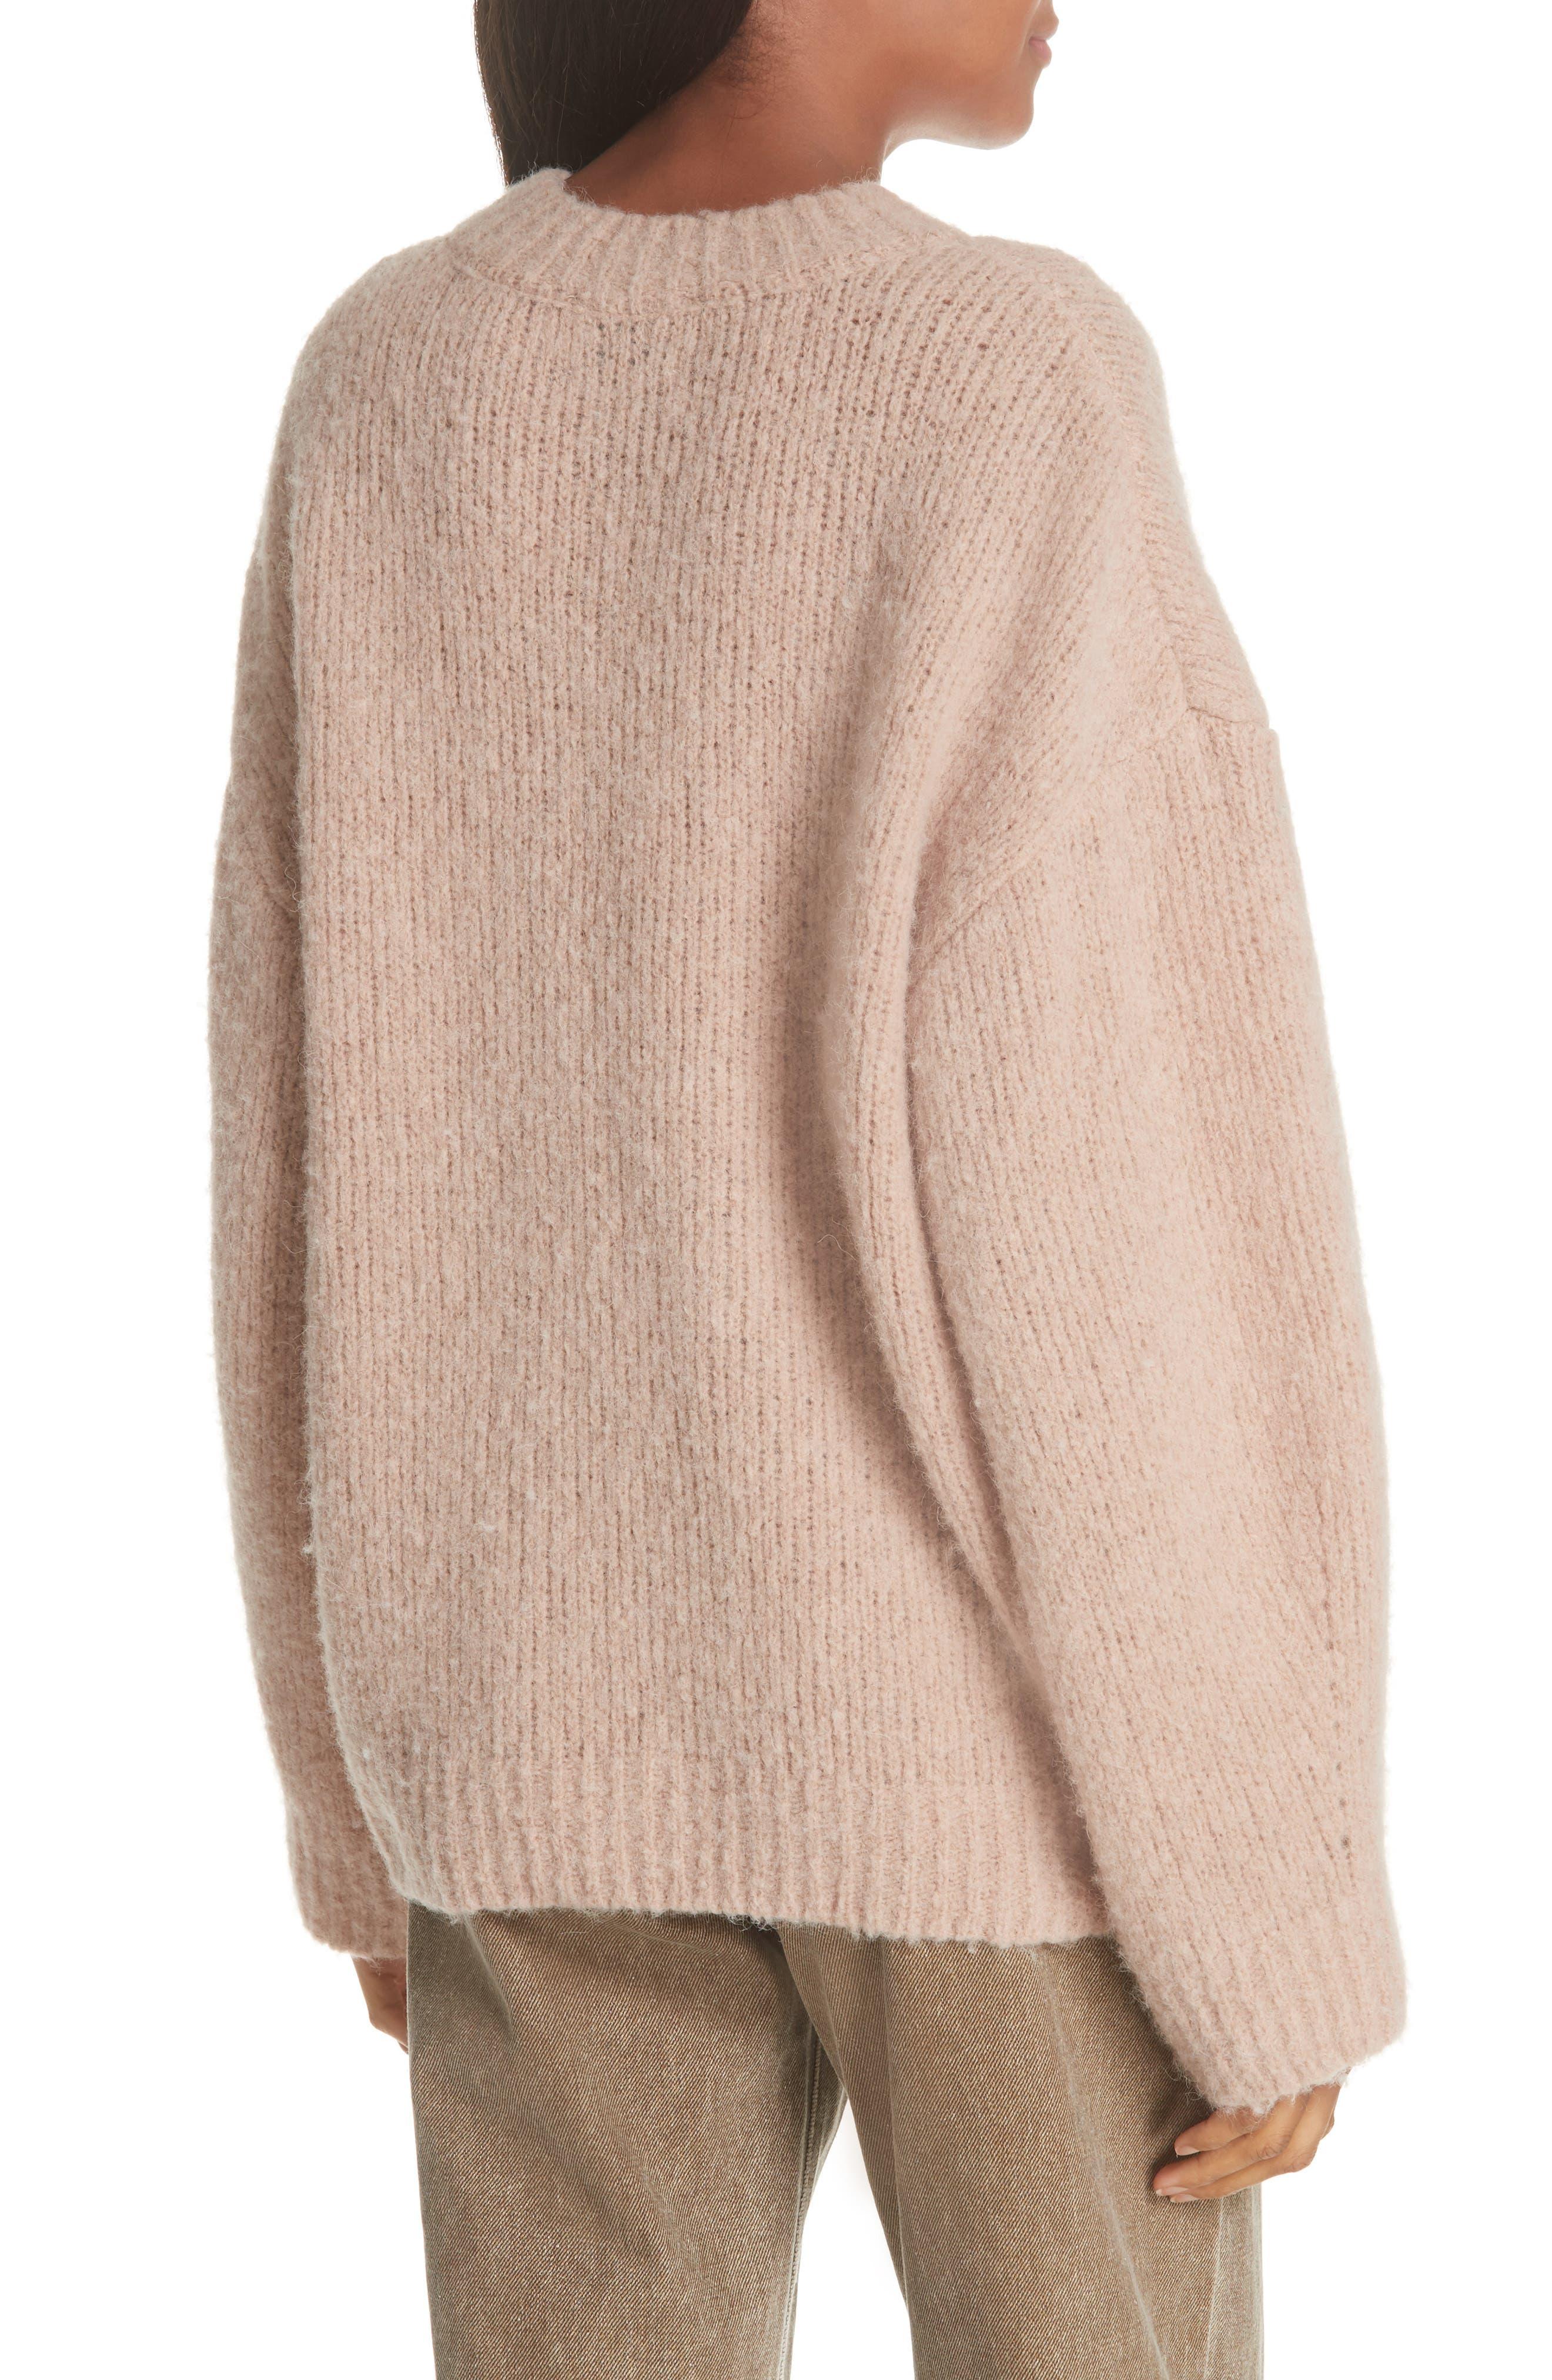 Tuesday Wool & Alpaca Blend Sweater in Blush